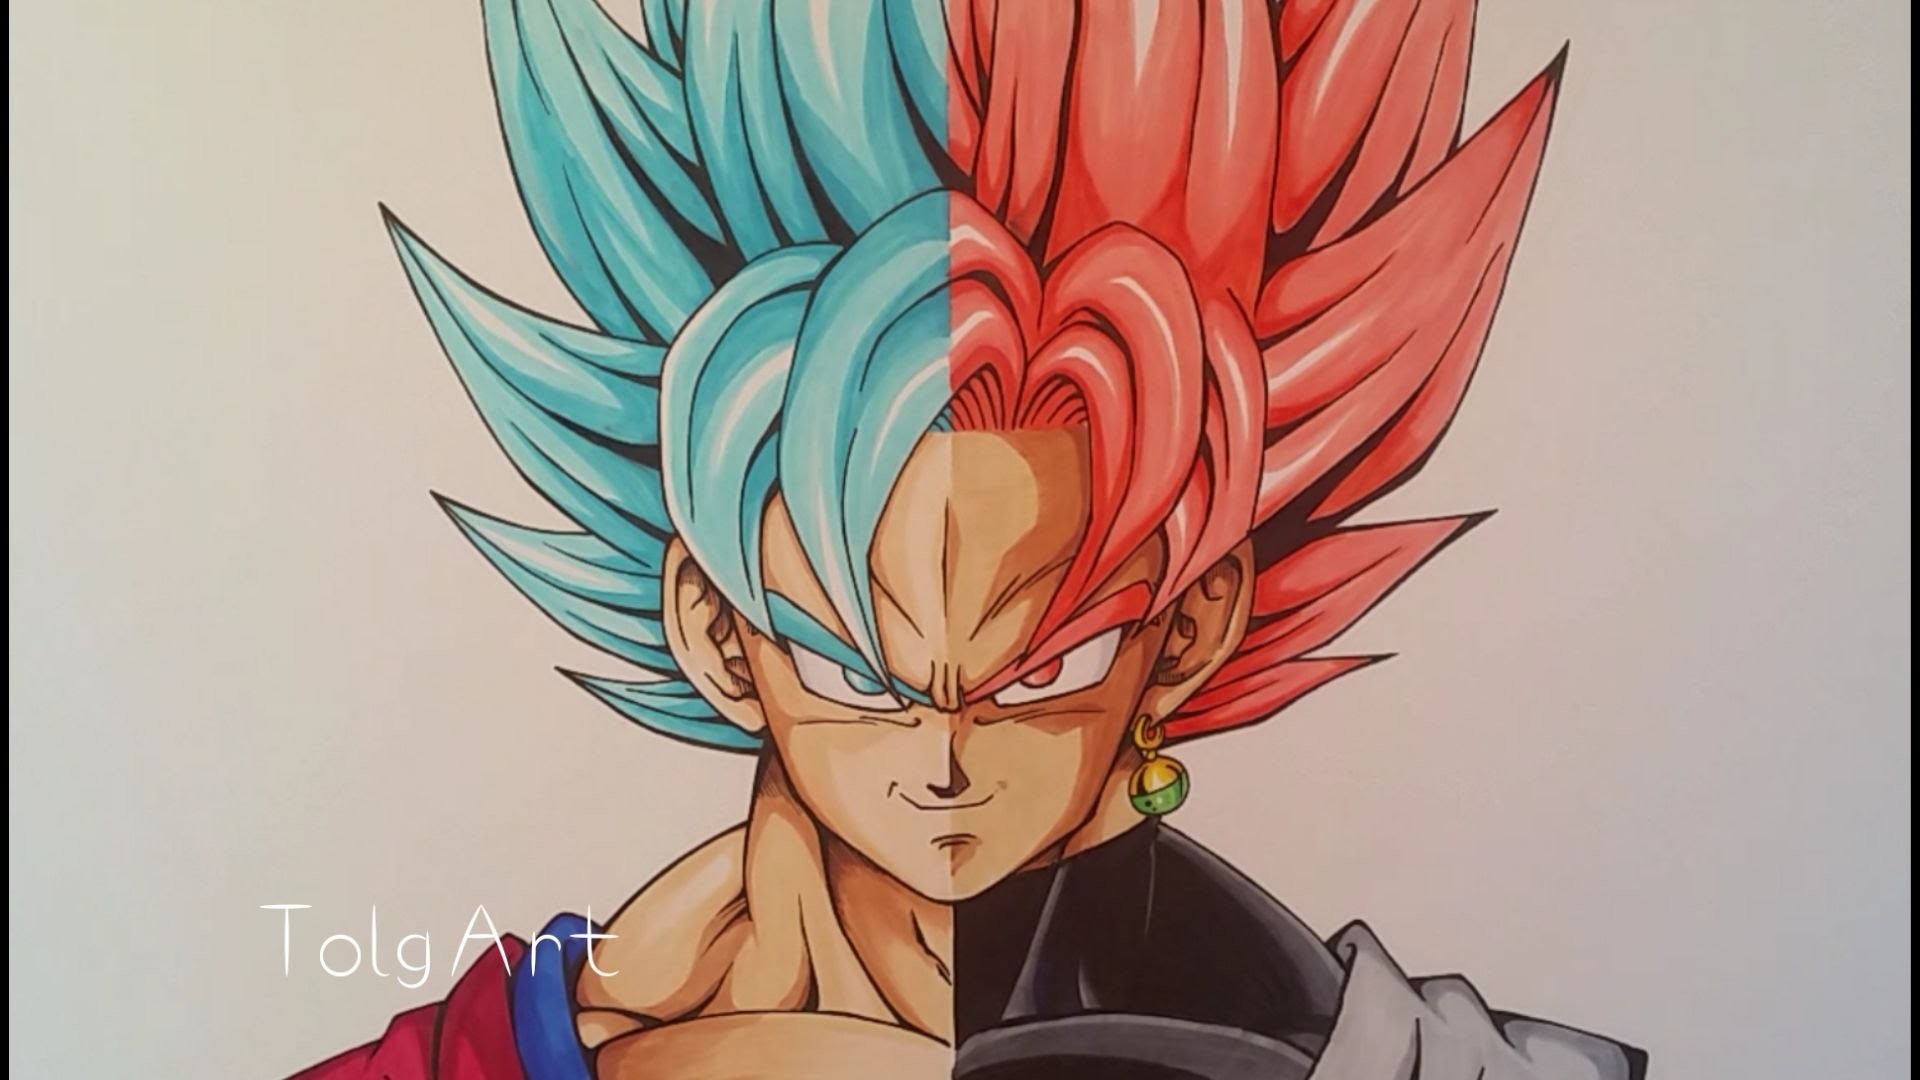 Goku Black Ssj Rose Para Colorear: Drawing Goku Vs Black Goku, Super Saiyan Blue Vs Rose